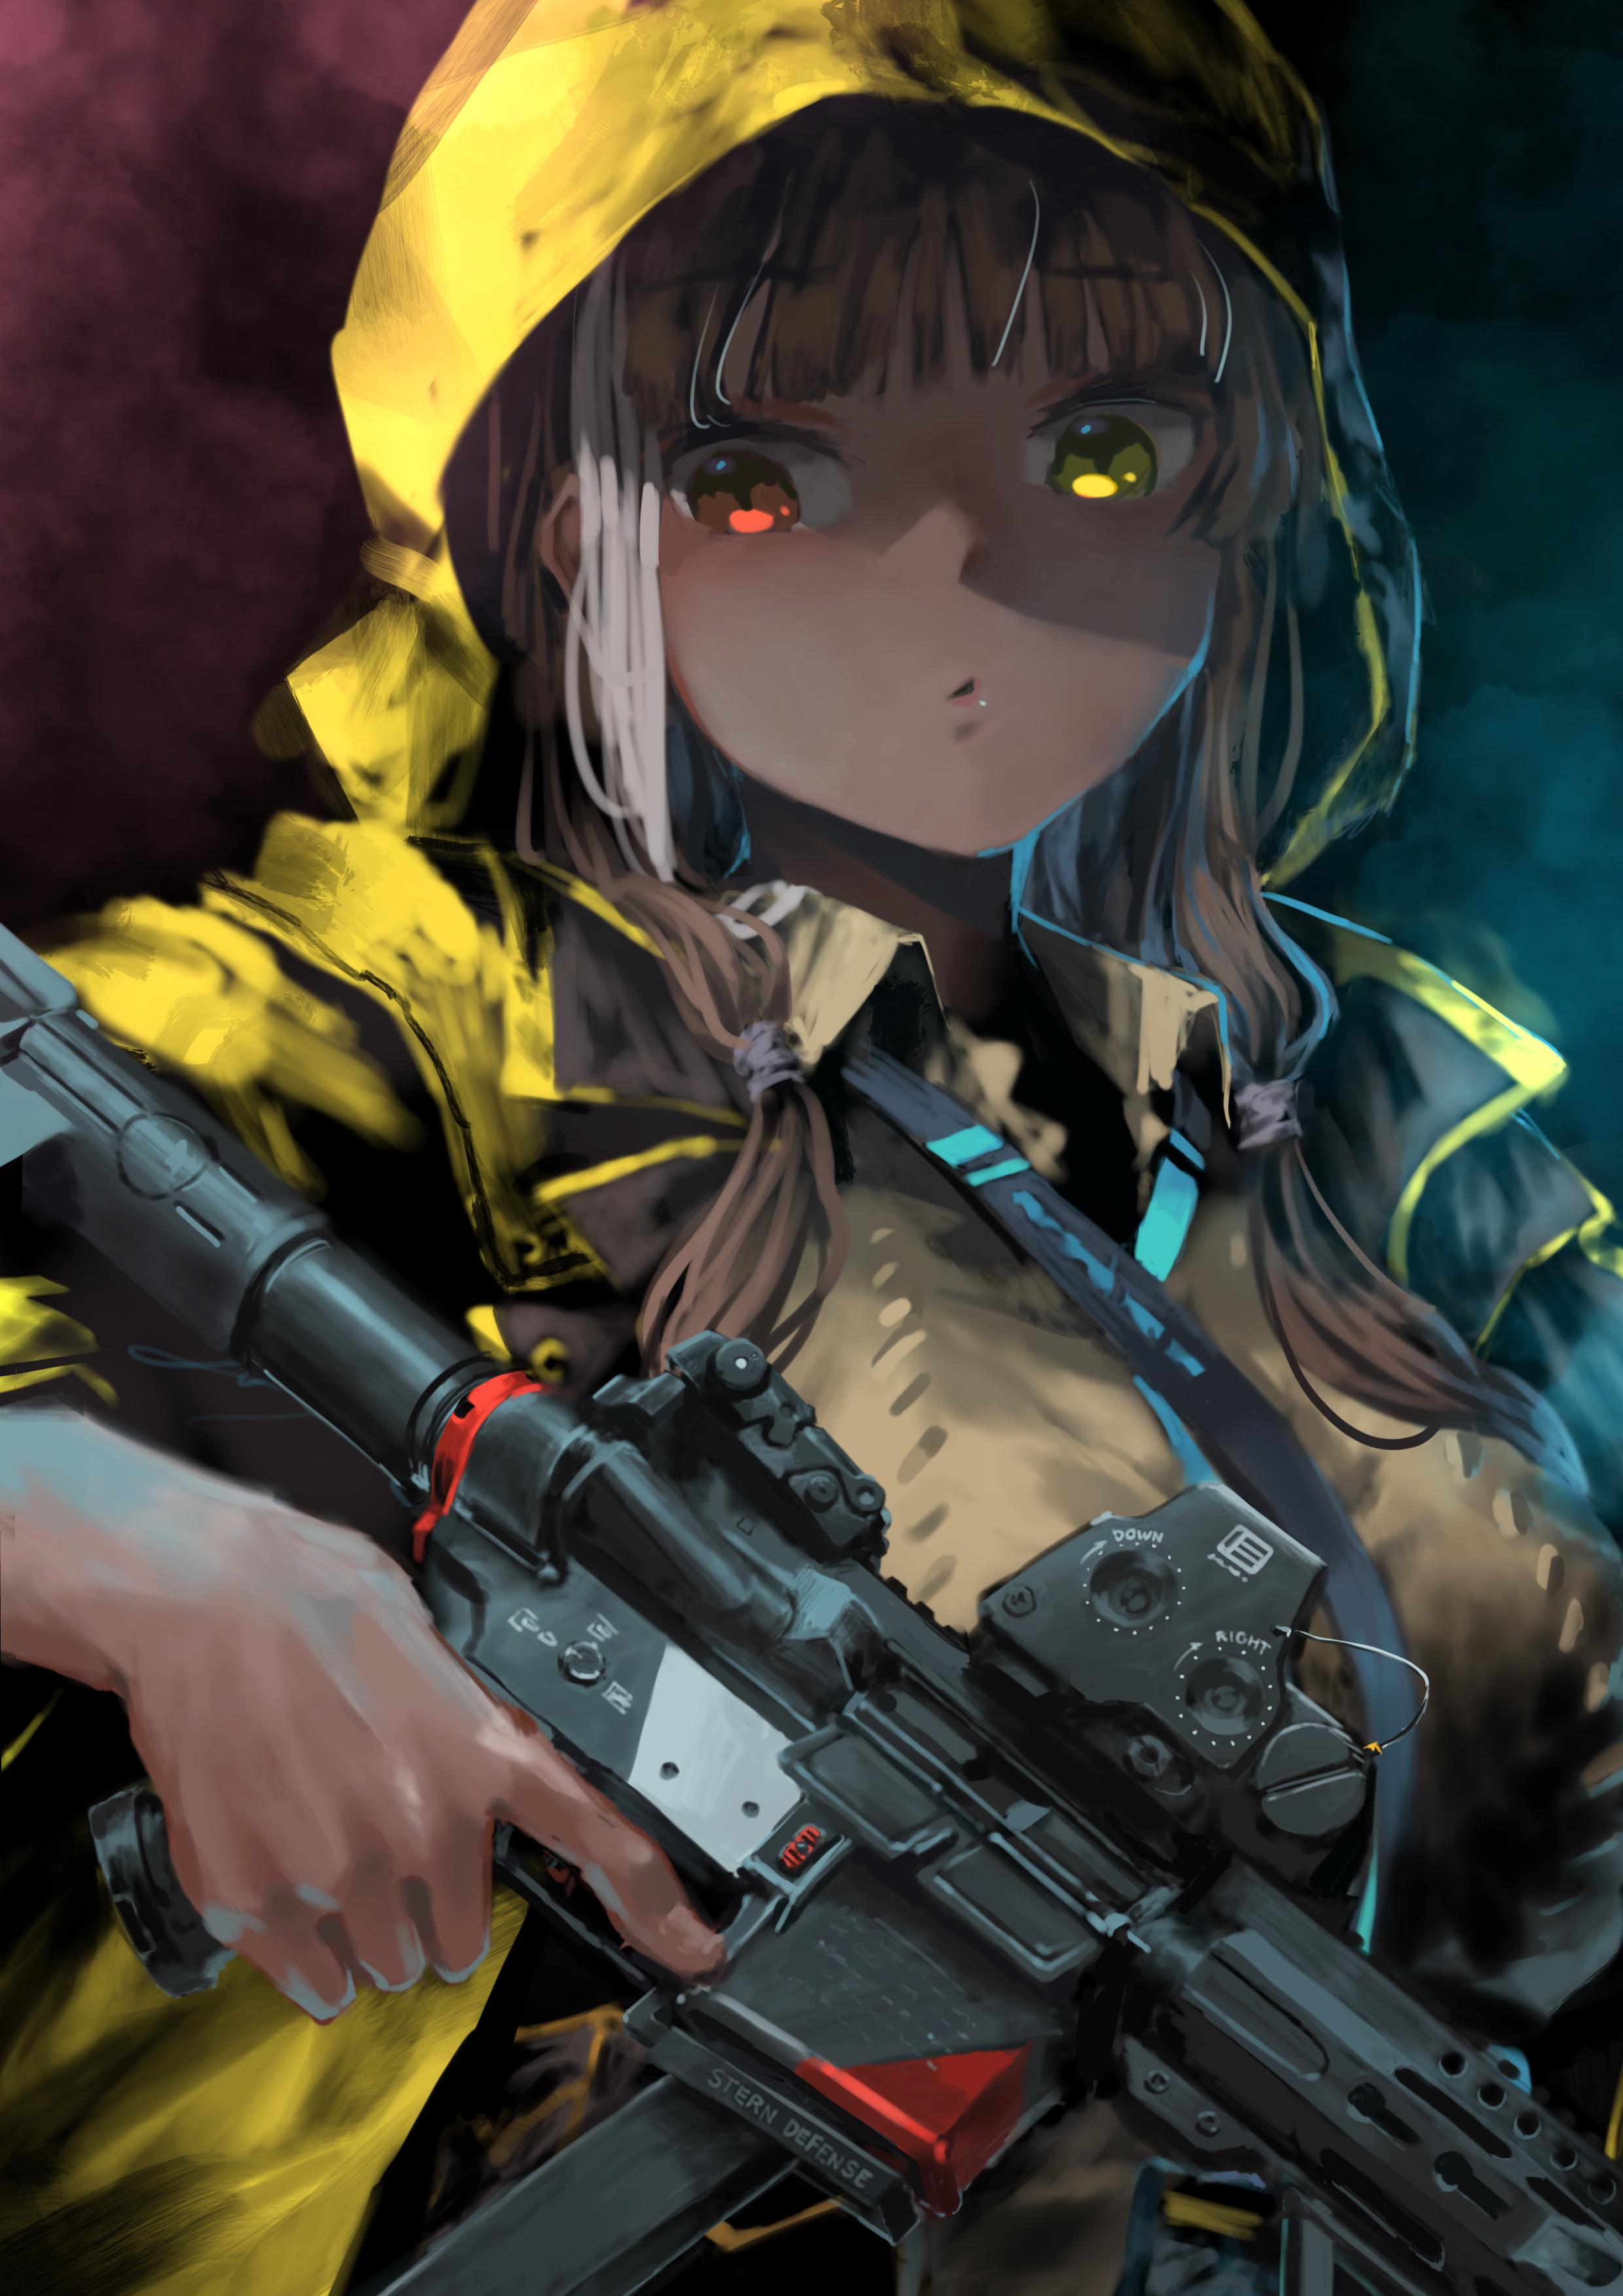 Wallpaper Anime Girls White Hair Red Eyes Yellow Eyes Gun Girls Frontline 2480x3508 Richs 1619315 Hd Wallpapers Wallhere